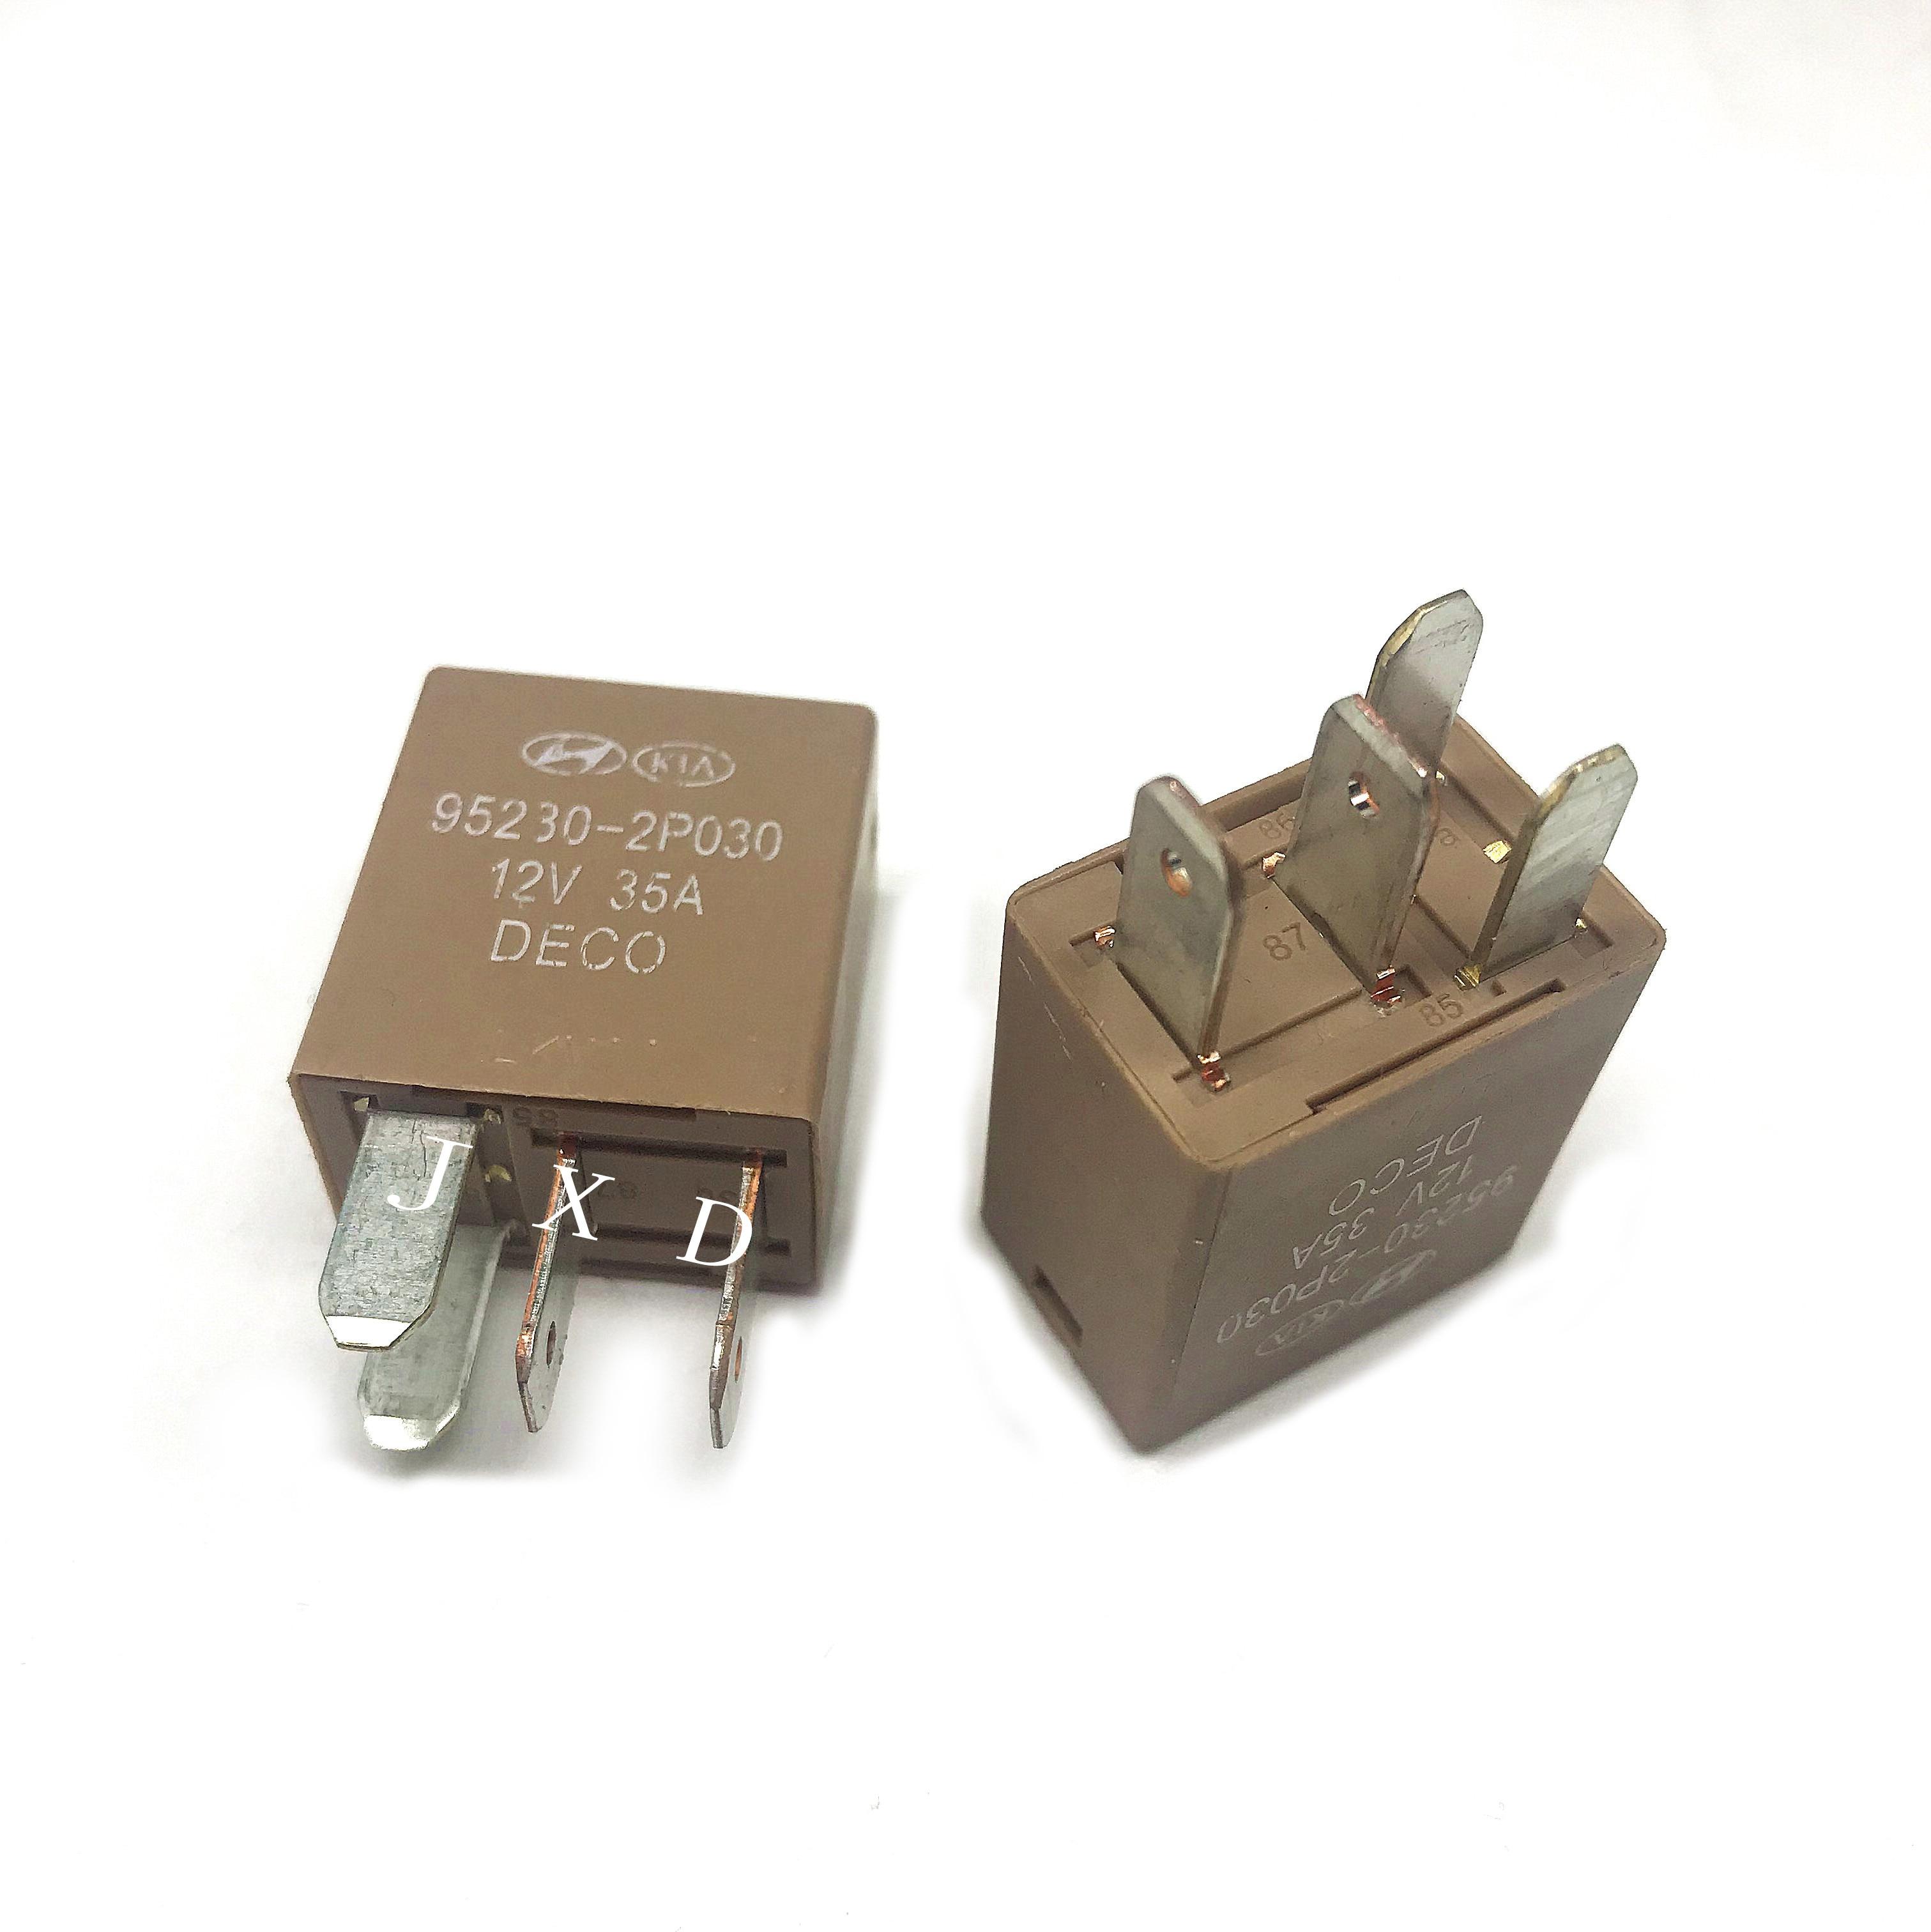 HOT NEW air conditioner fan relay 12V relay 95230-2P030 952302P030 95230 2P030 35A 12VDC DC12V 12V4PIN